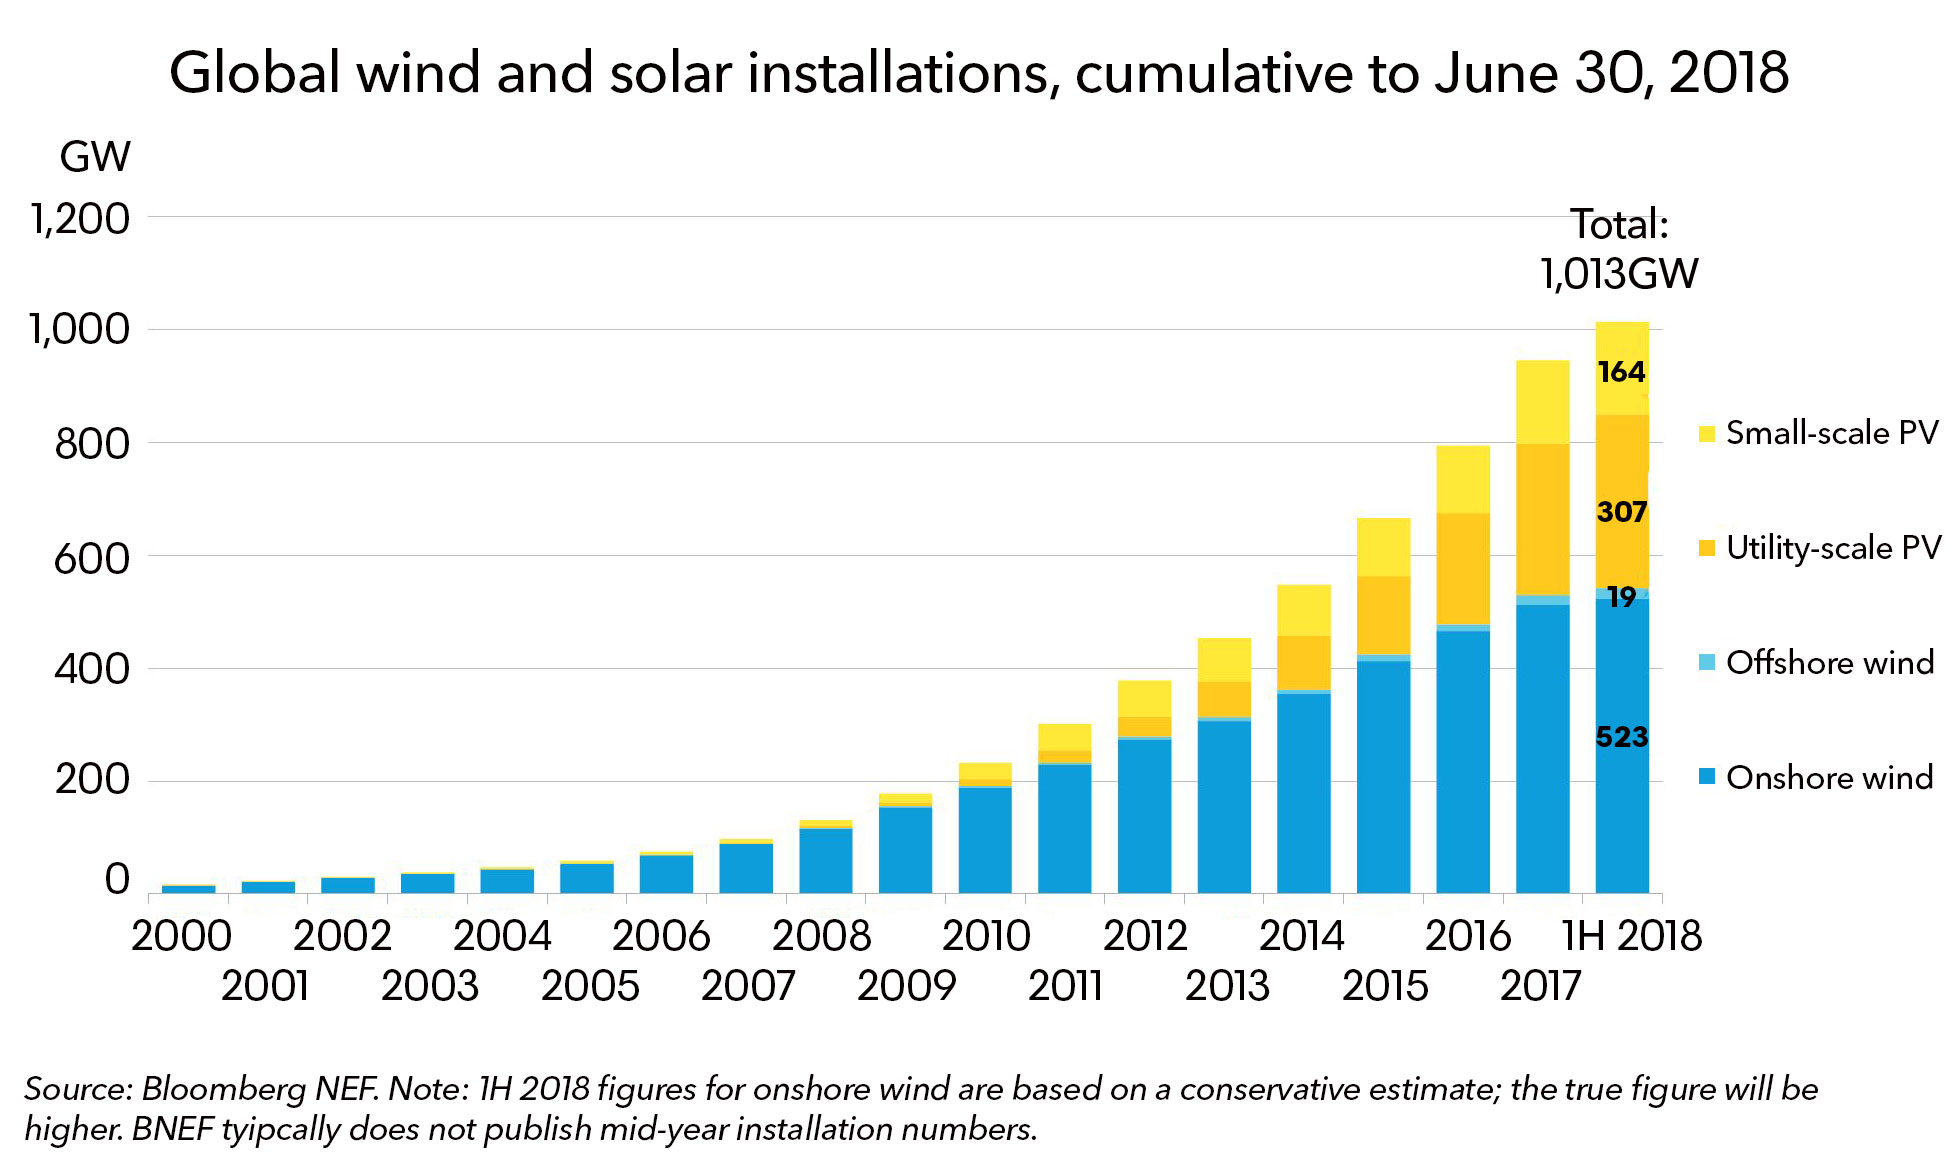 http://www.energiatalous.fi/wp-content/uploads/2018/08/1000GW-blog-chart-1.jpg